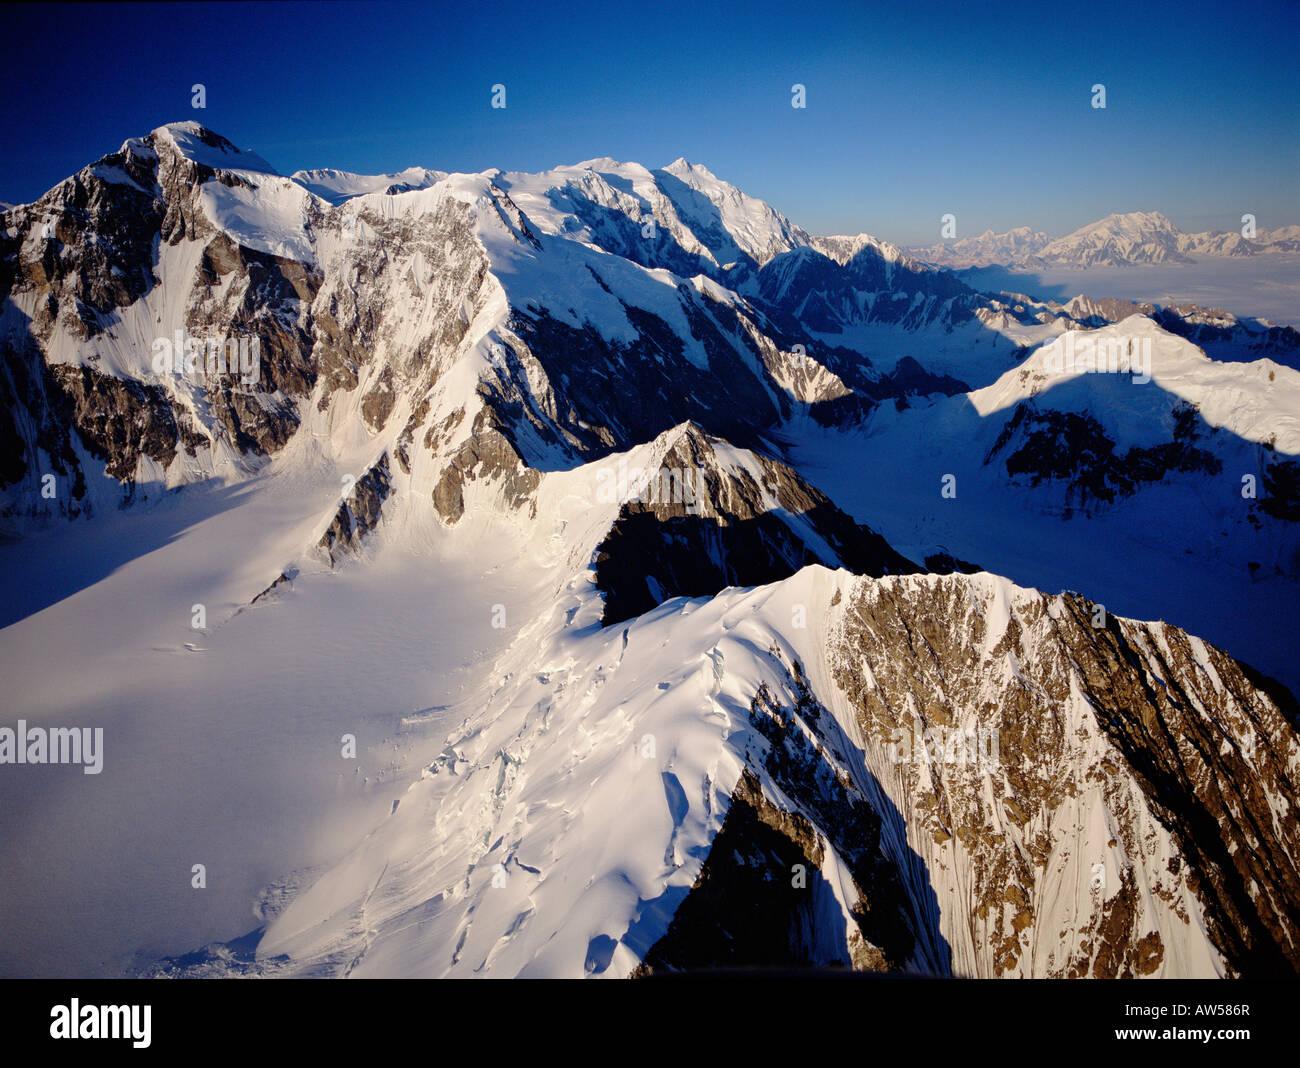 Mt. Logan, Yukon Territory - Stock Image